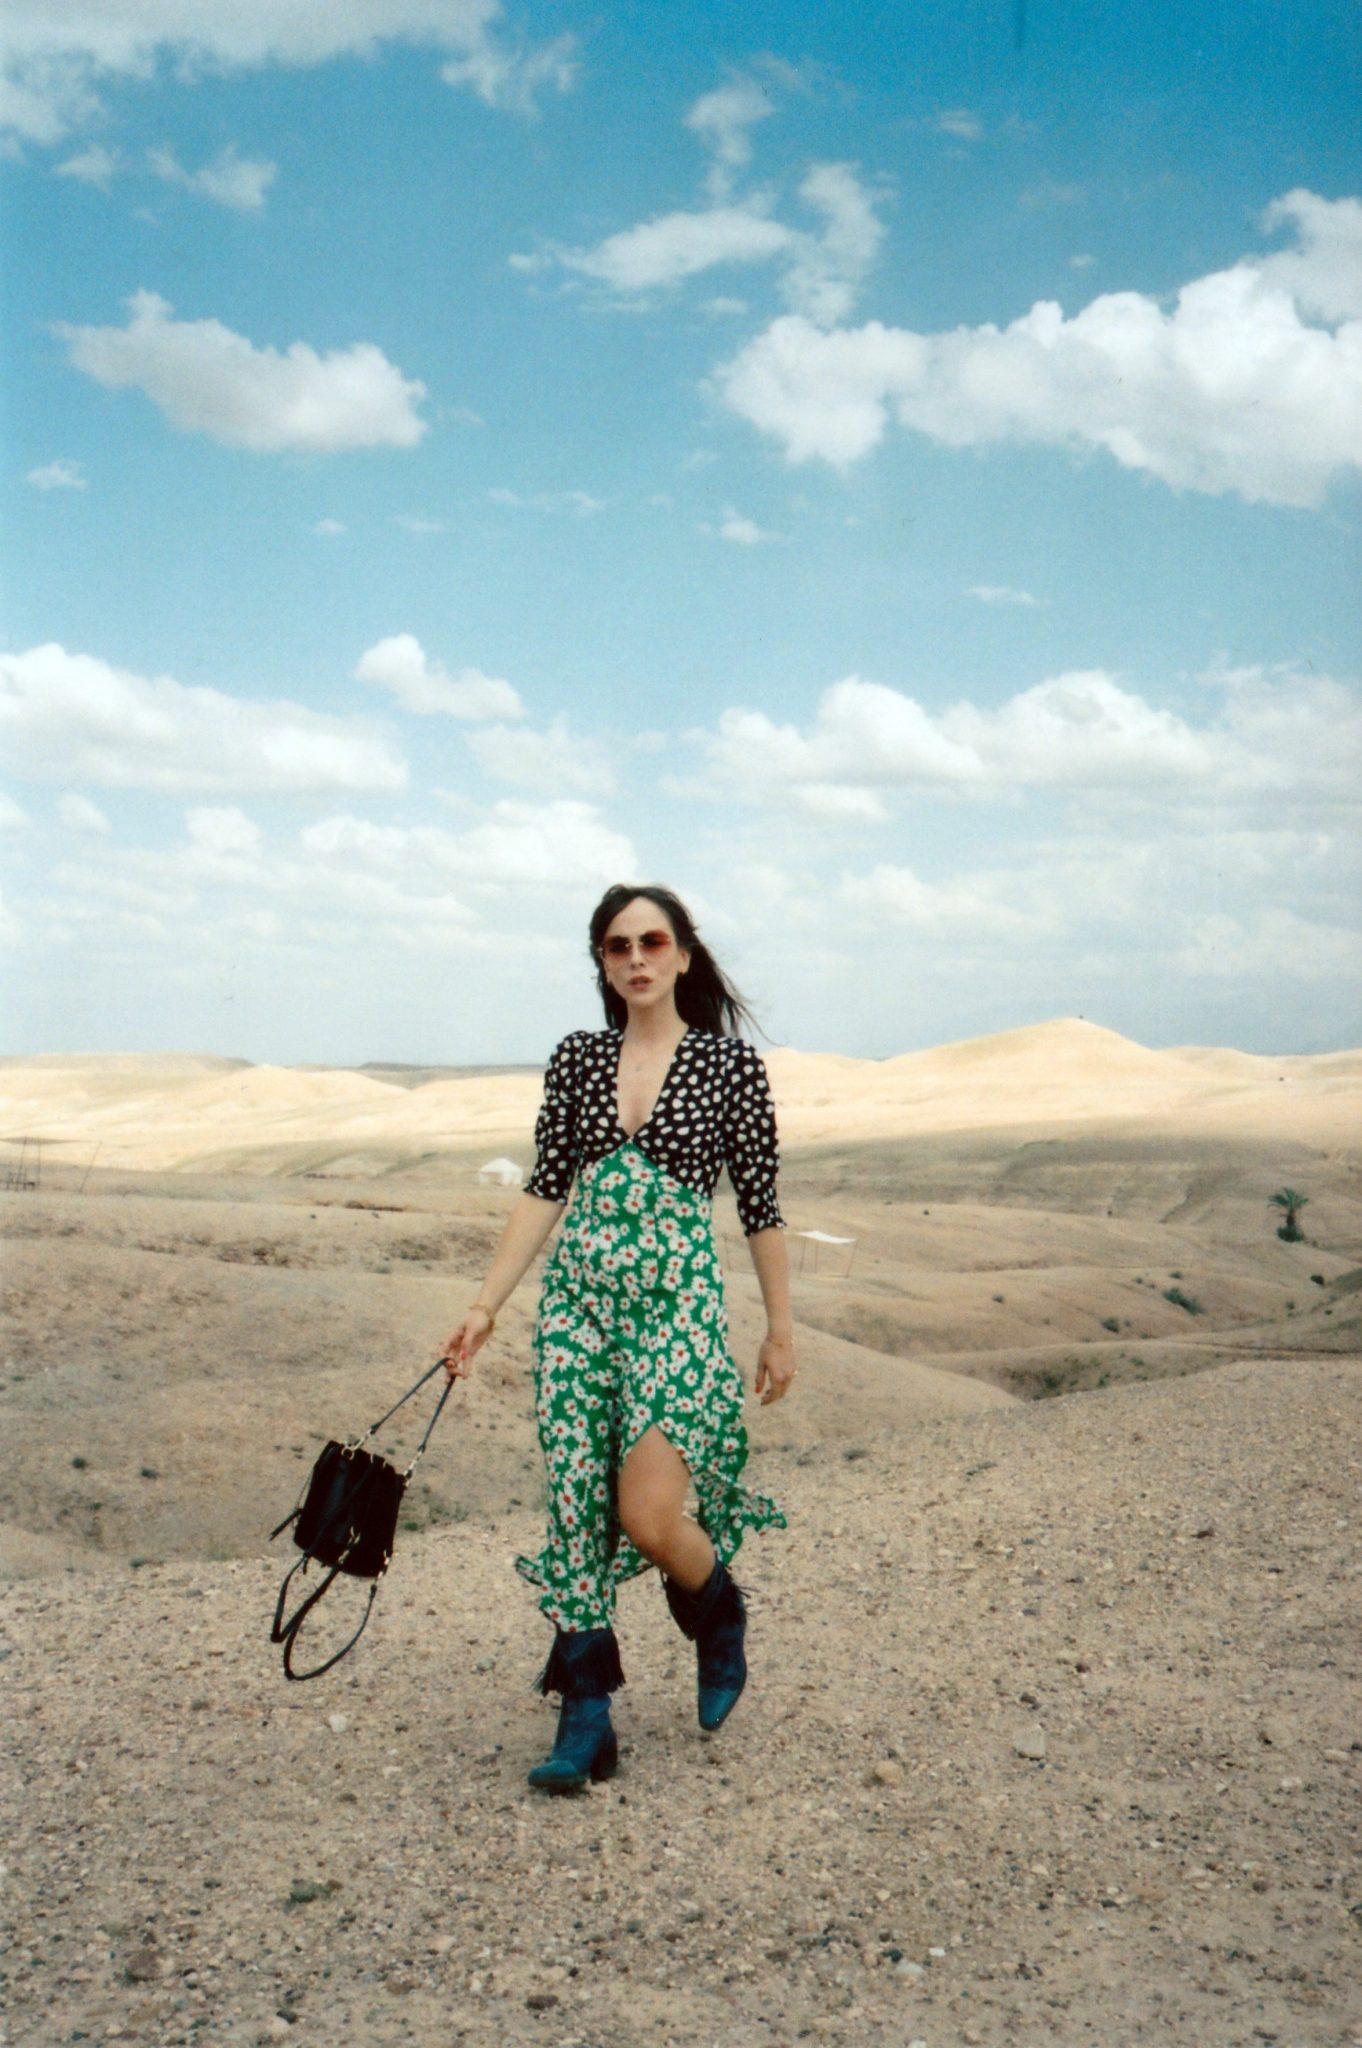 MEGAN ELLABY FILM PHOTOGRAPHY